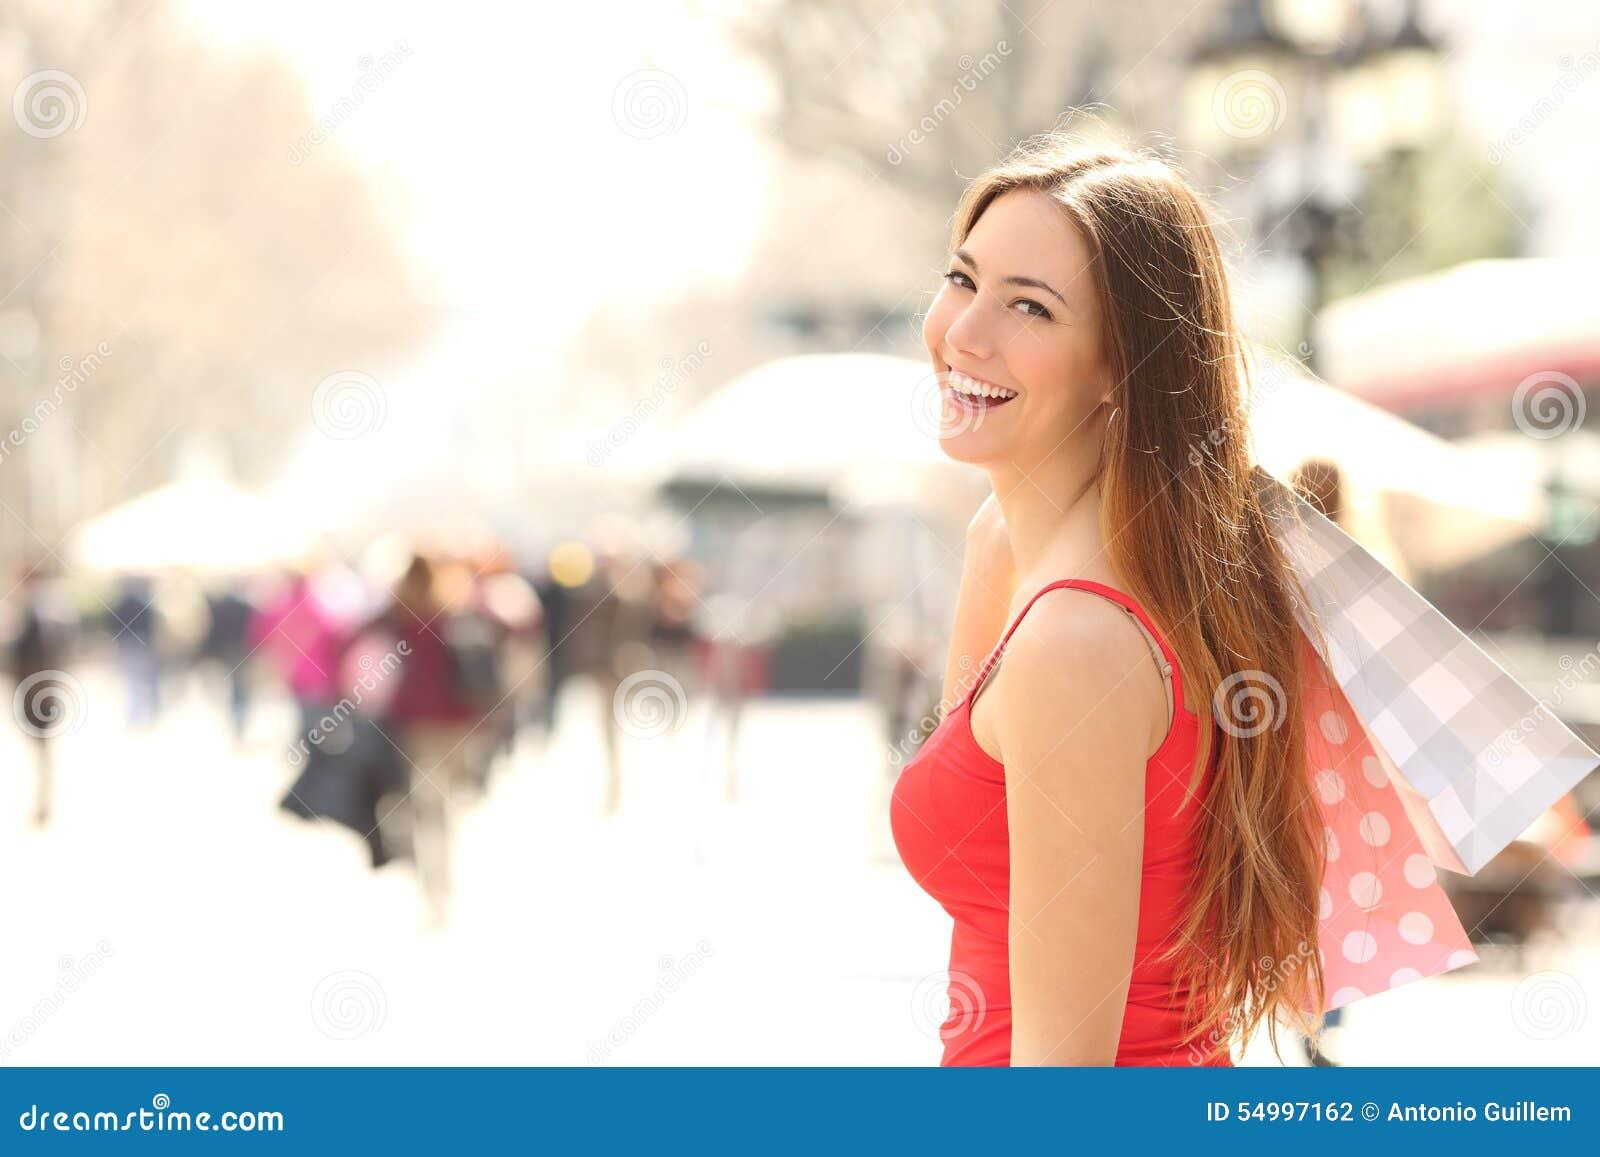 Shopper woman shopping in the street in summer